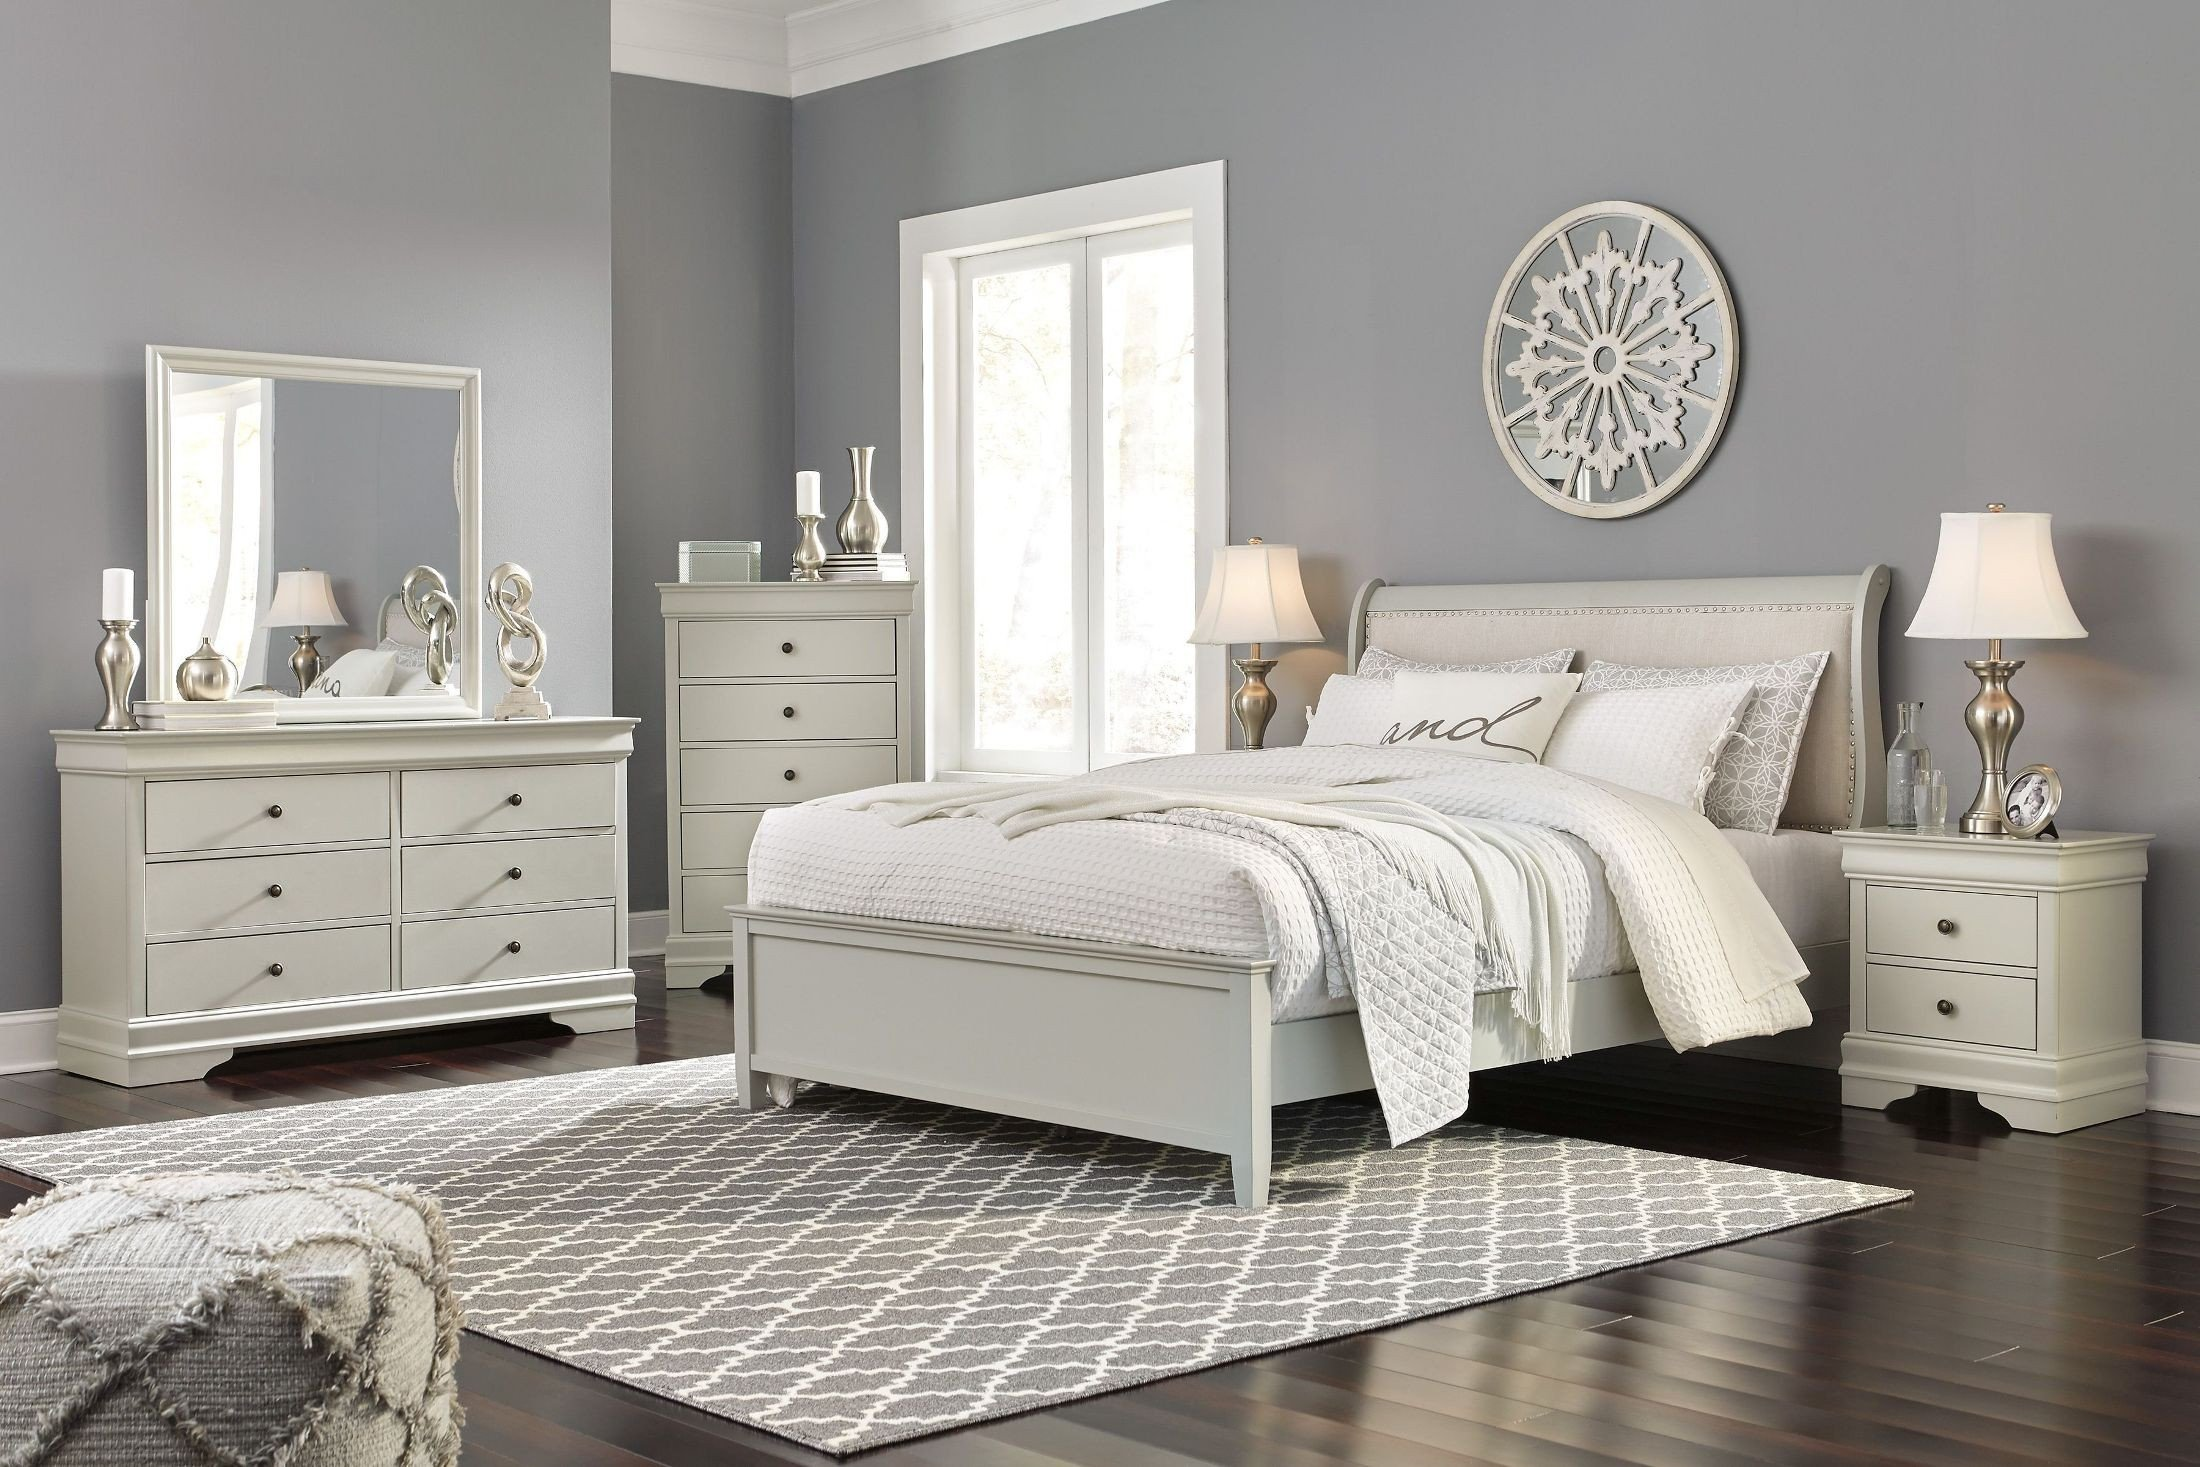 Tommy Bahama Bedroom Set New Emma Mason Signature Jarred 5 Piece Sleigh Bedroom Set In Gray